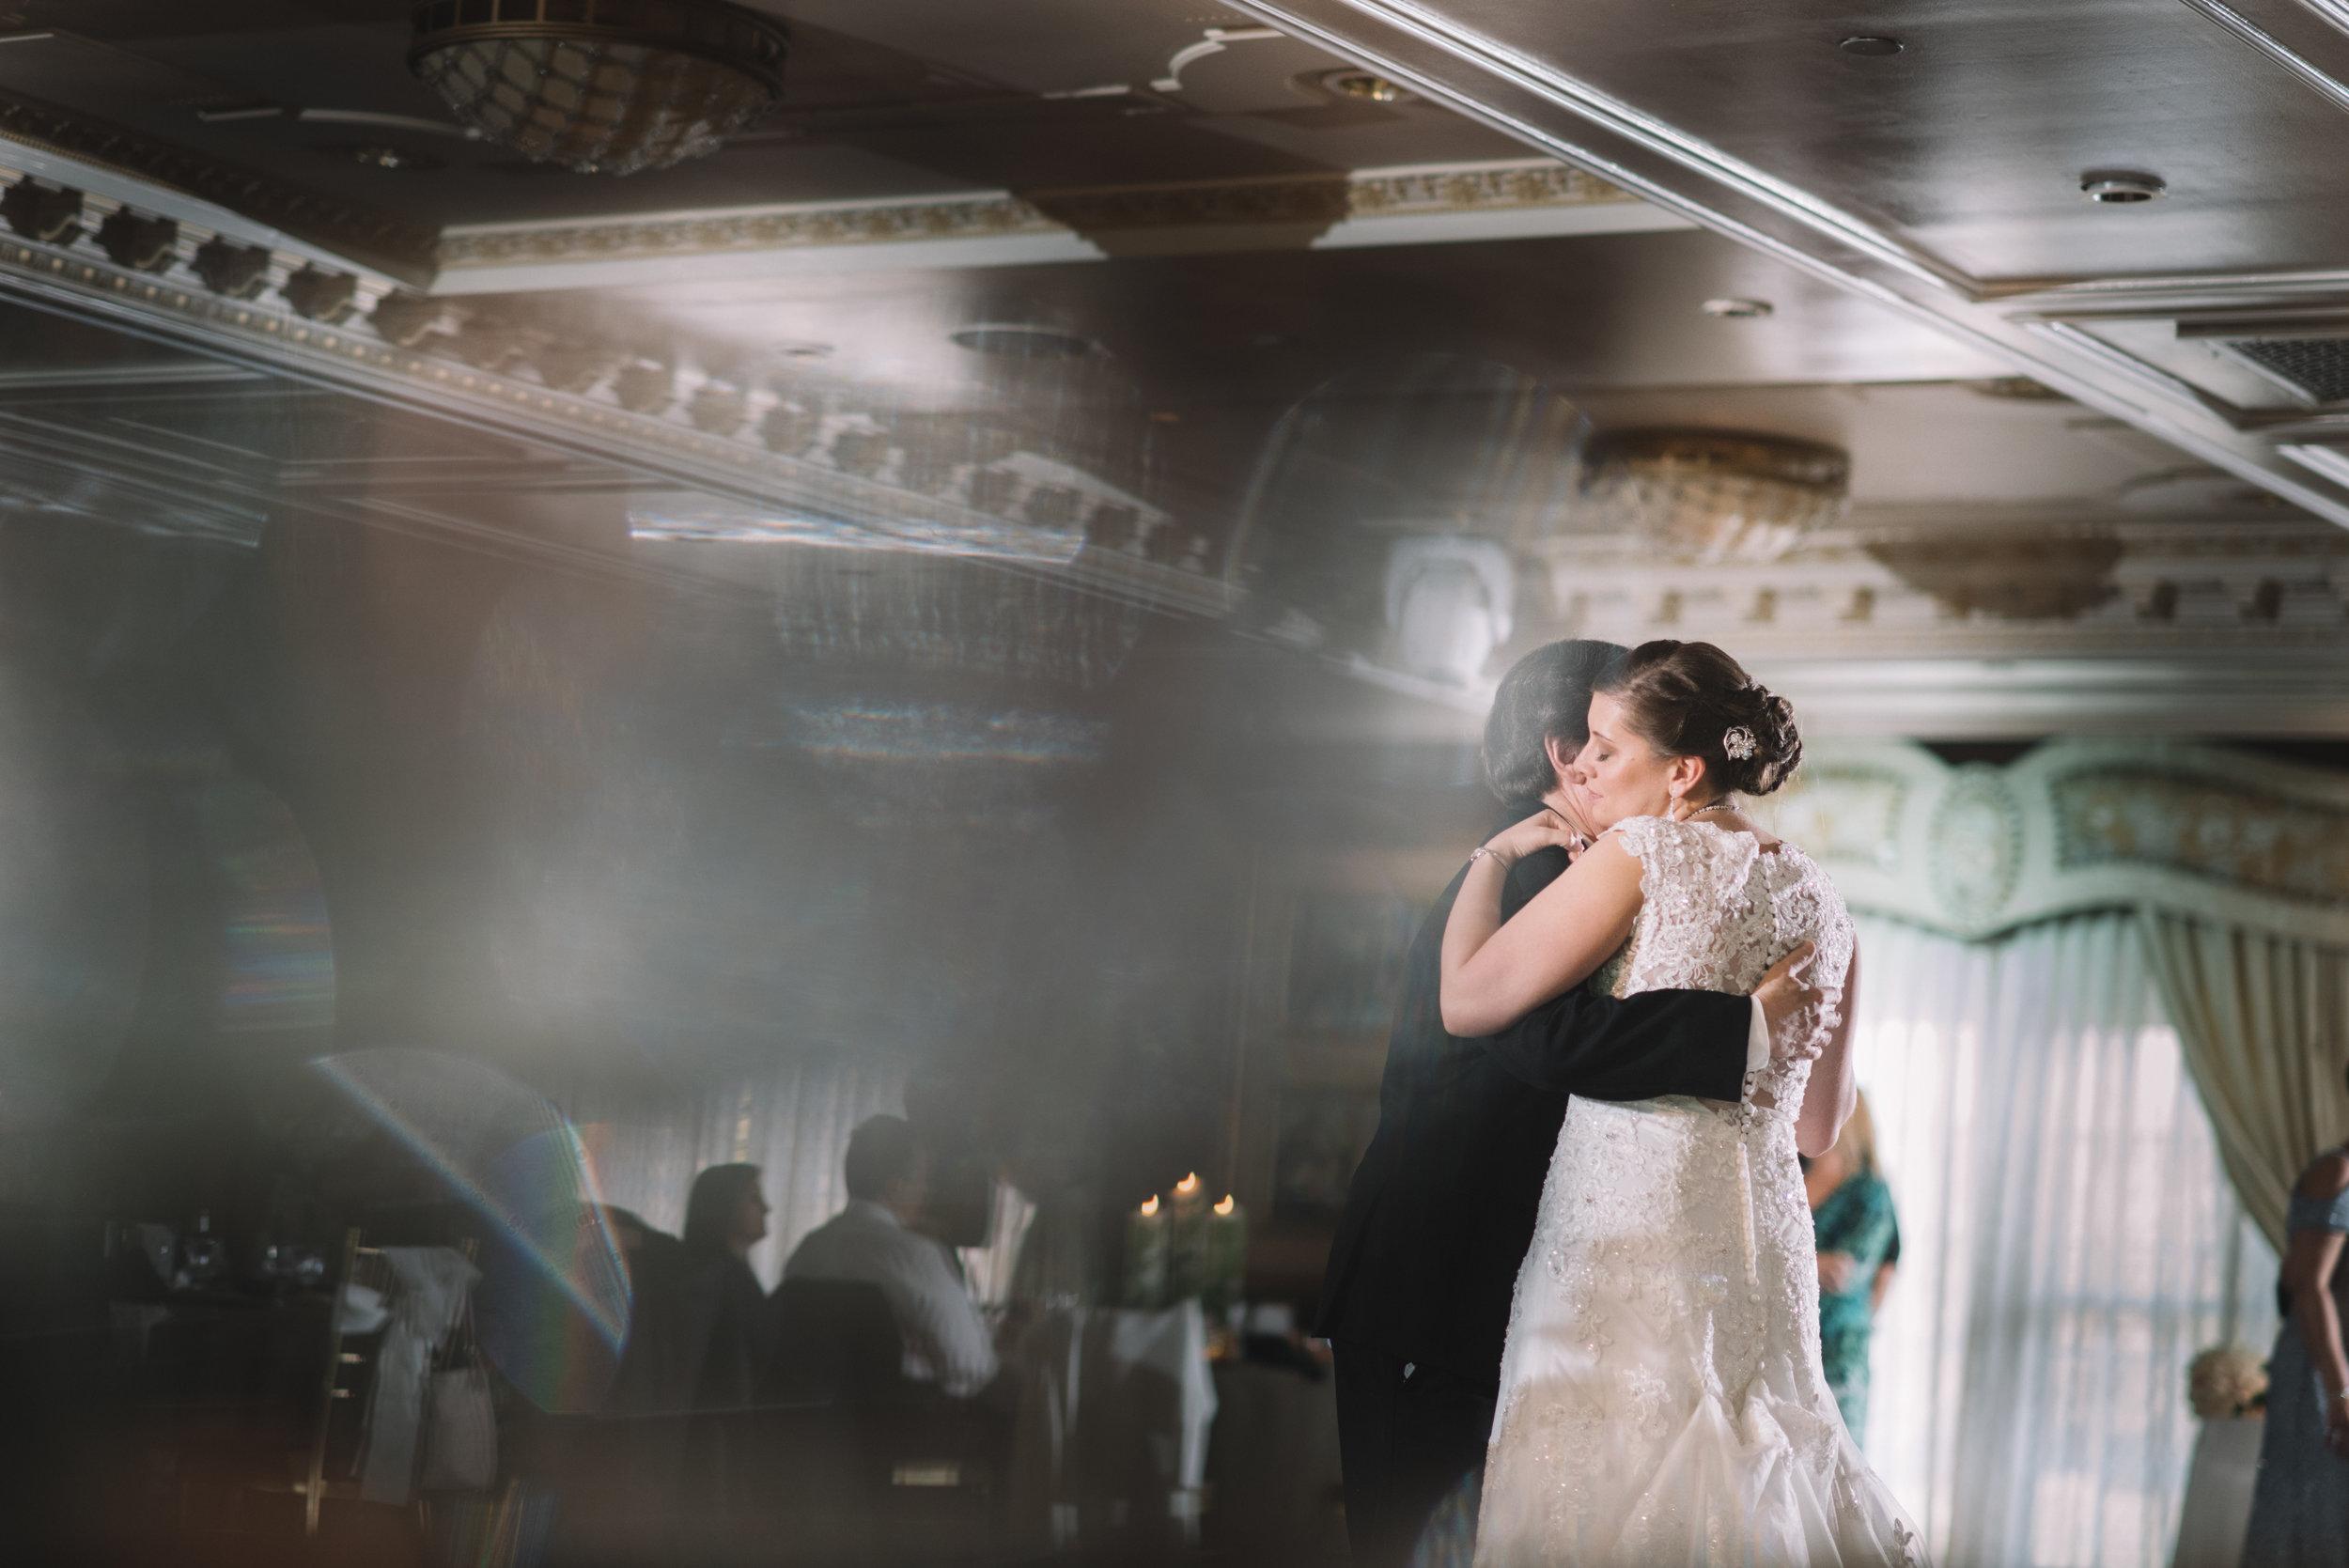 WeddingPhotos | NJPhotographer | Highlights-1-31.jpg